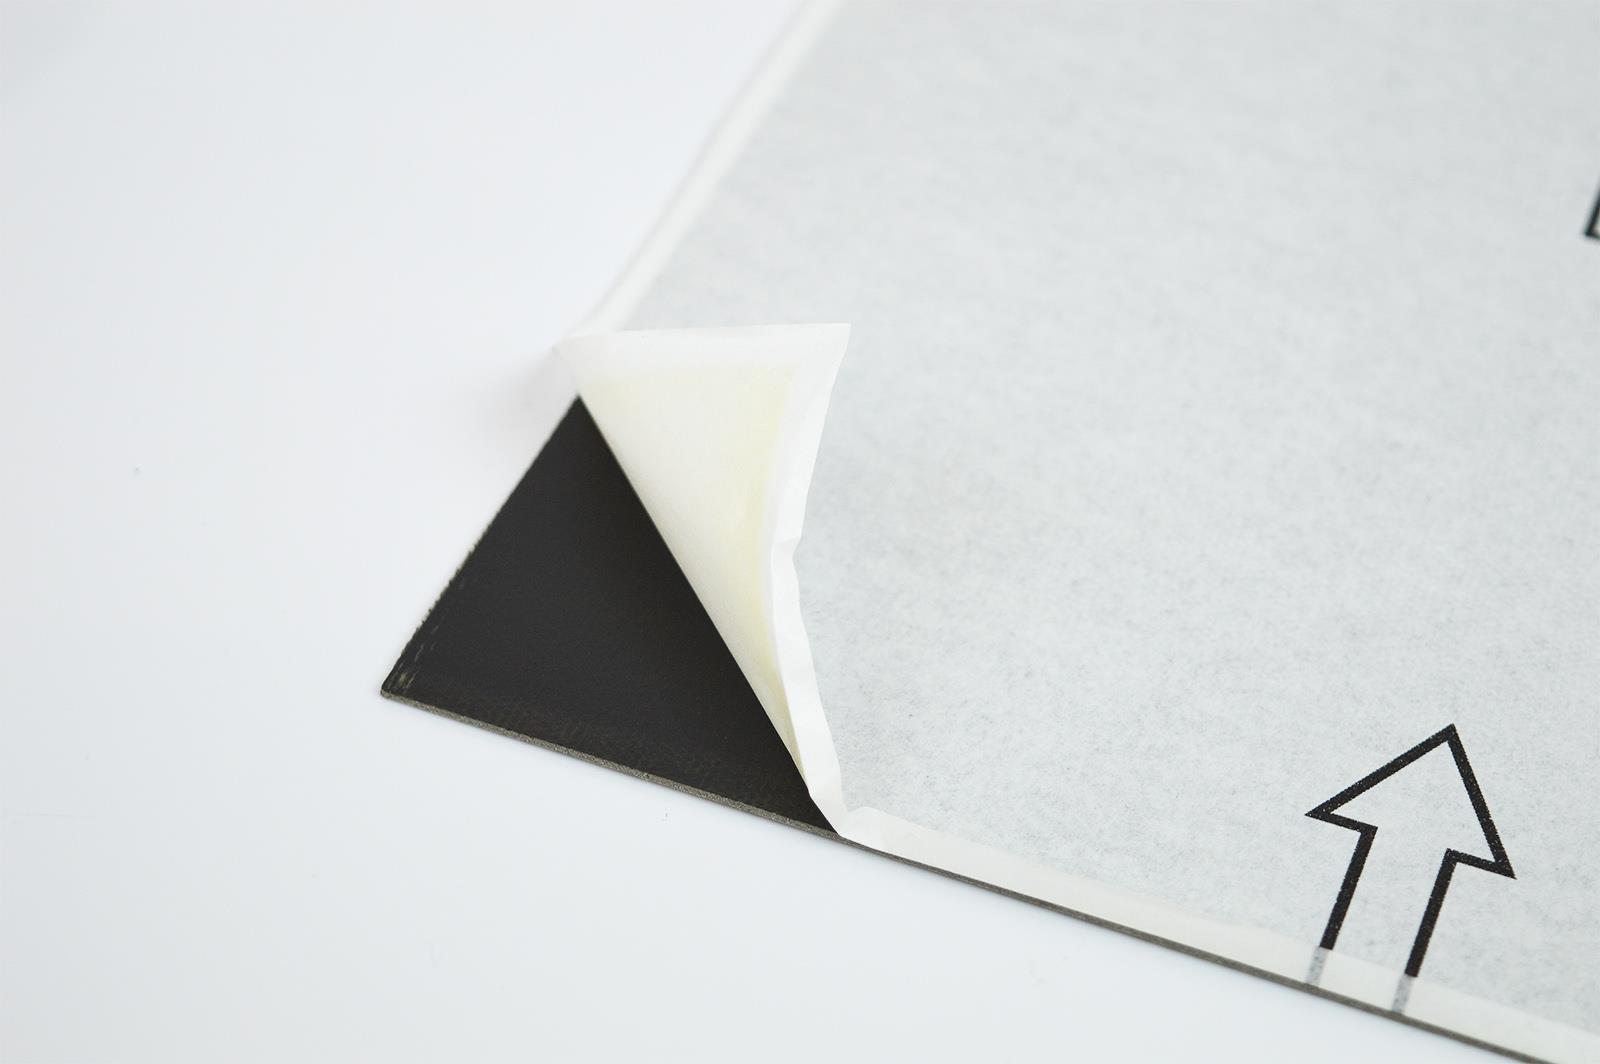 Floor-Tiles-Self-Adhesive-Vinyl-Flooring-Kitchen-Bathroom-Brown-Wood-Grain thumbnail 36